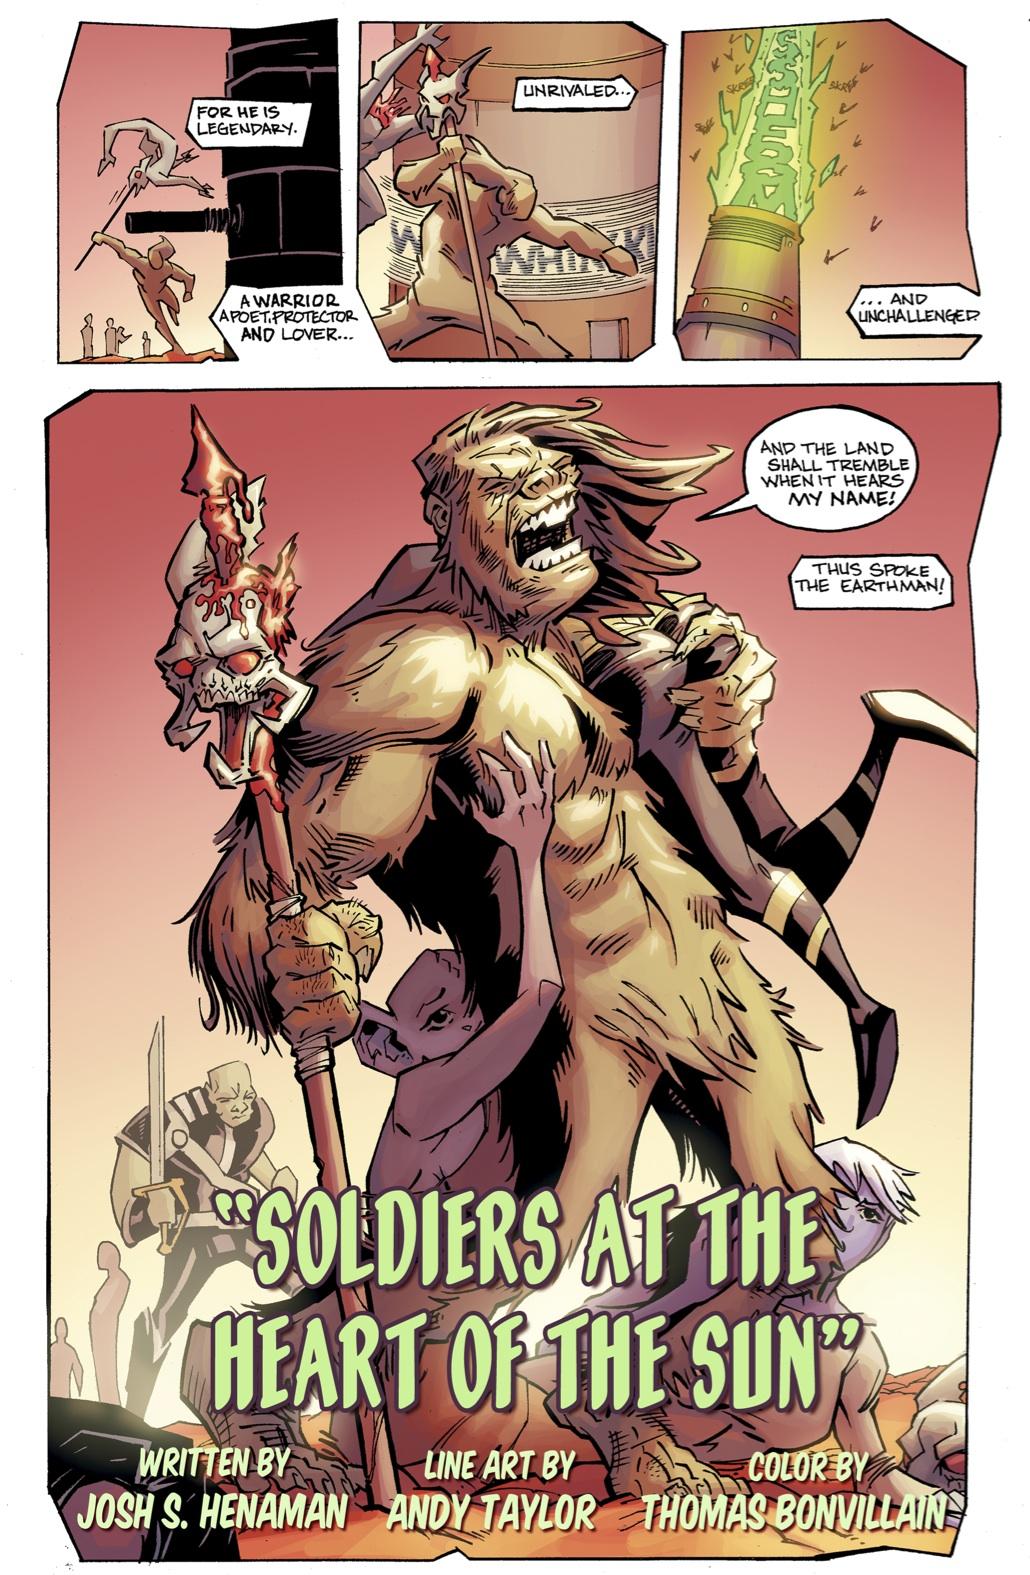 Bigfoot - Sword of the Earthman: Pre-Order Bigfoot Issue ...Bigfoot Comic